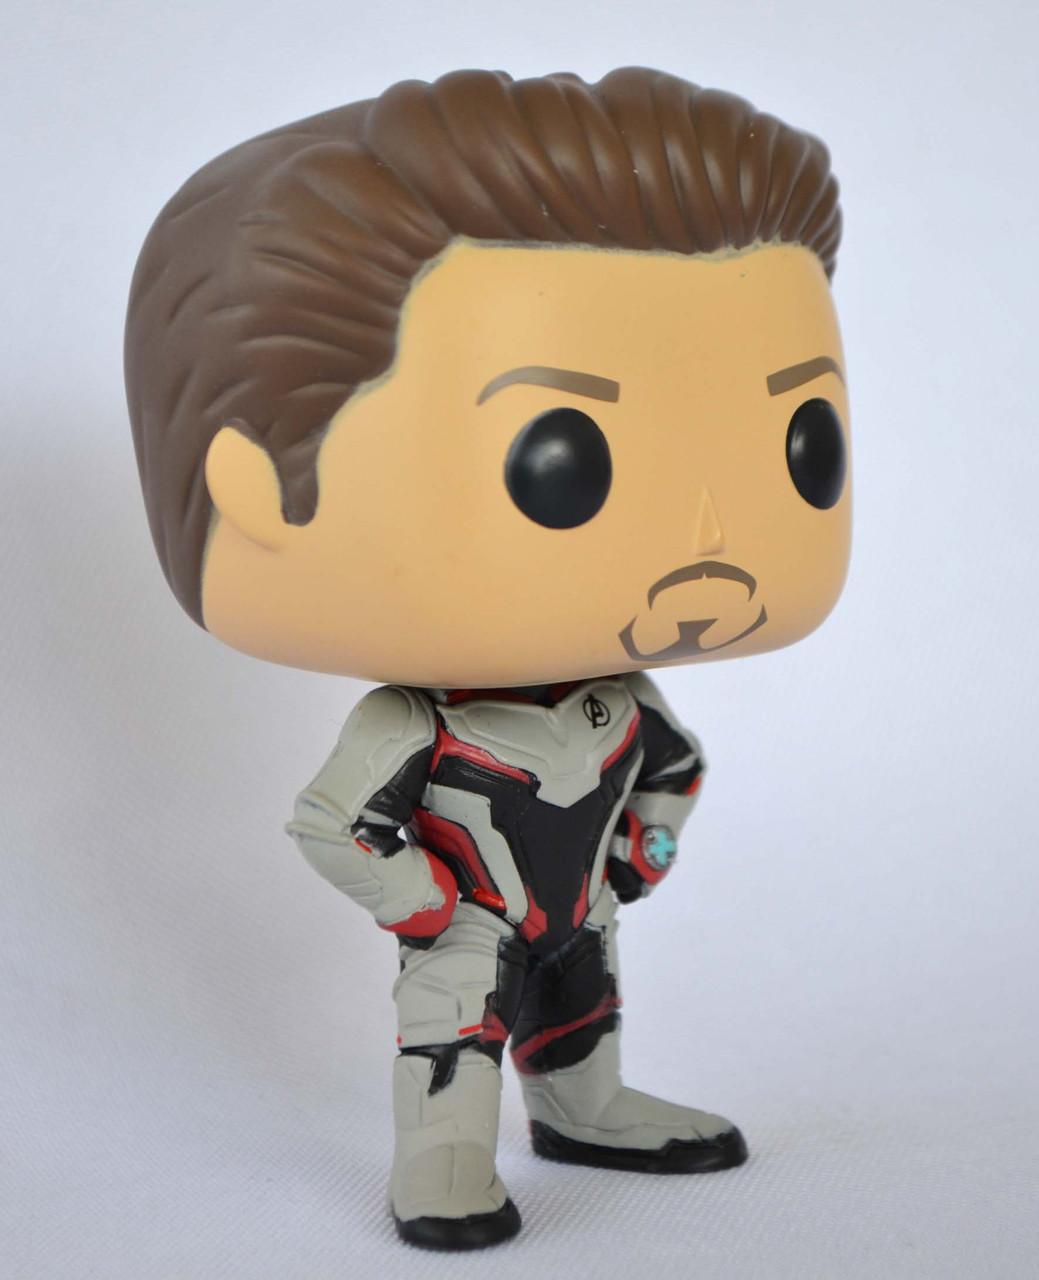 Коллекционная фигурка Funko Pop! Avengers Iron Man